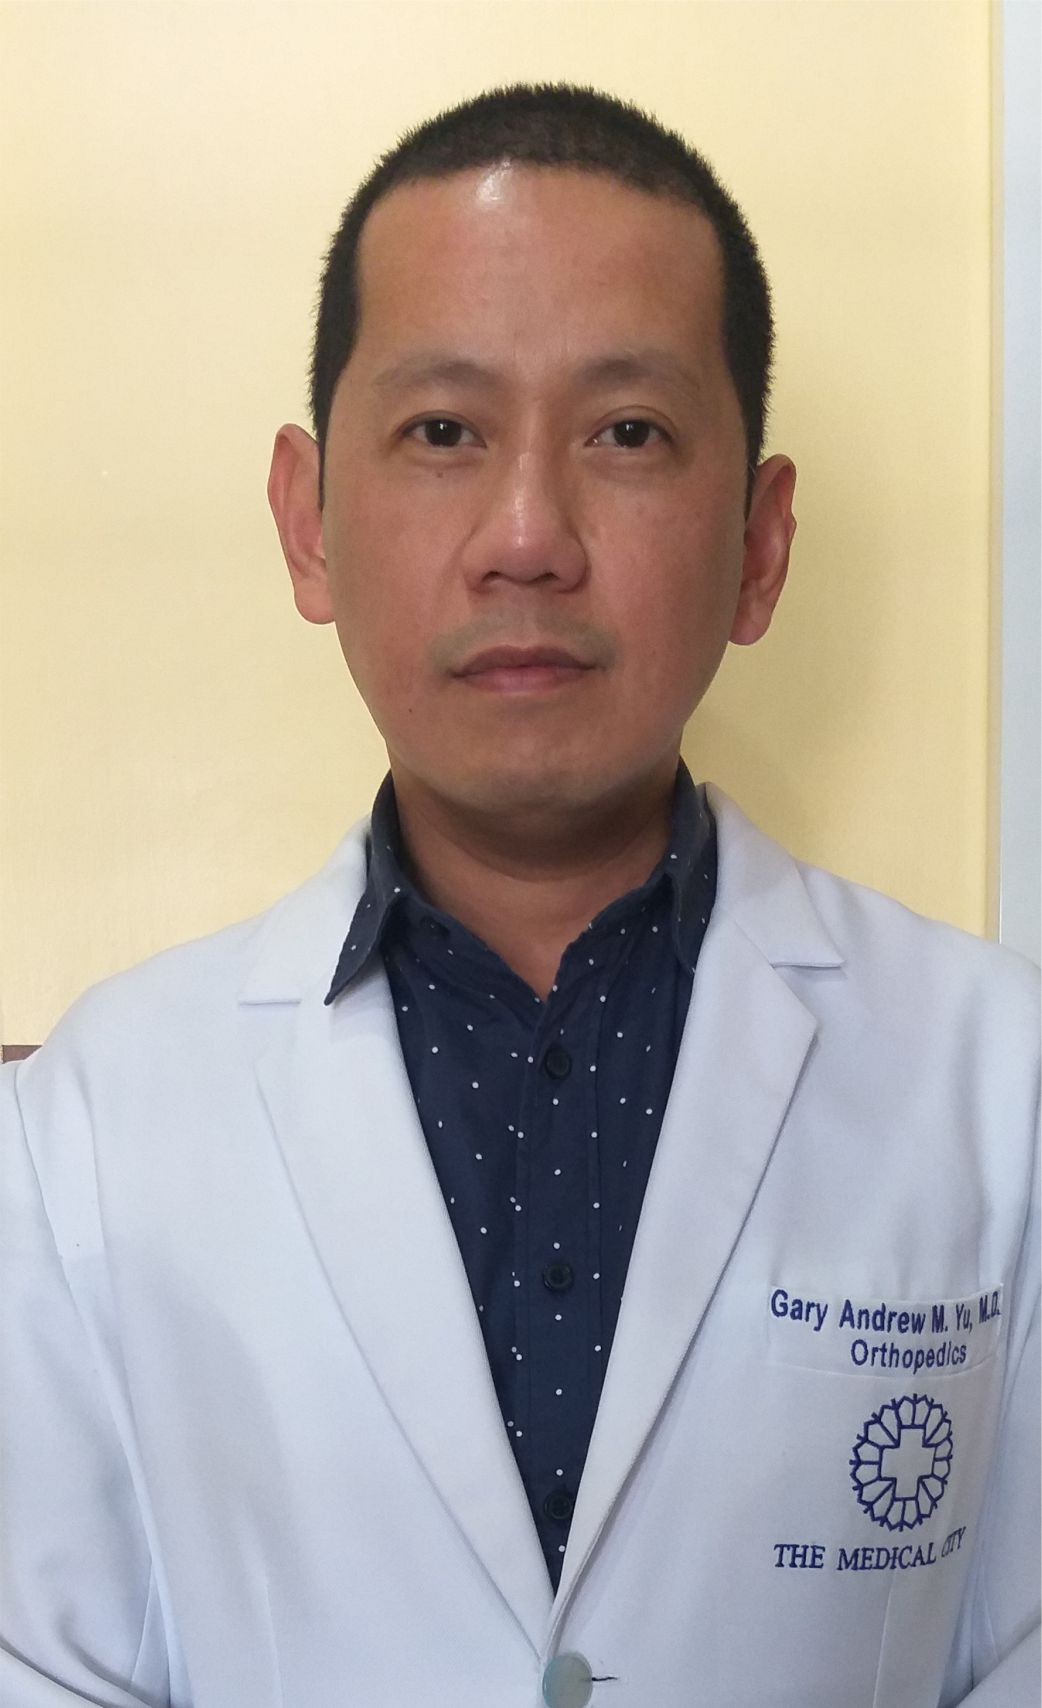 GARY ANDREW YU, MD